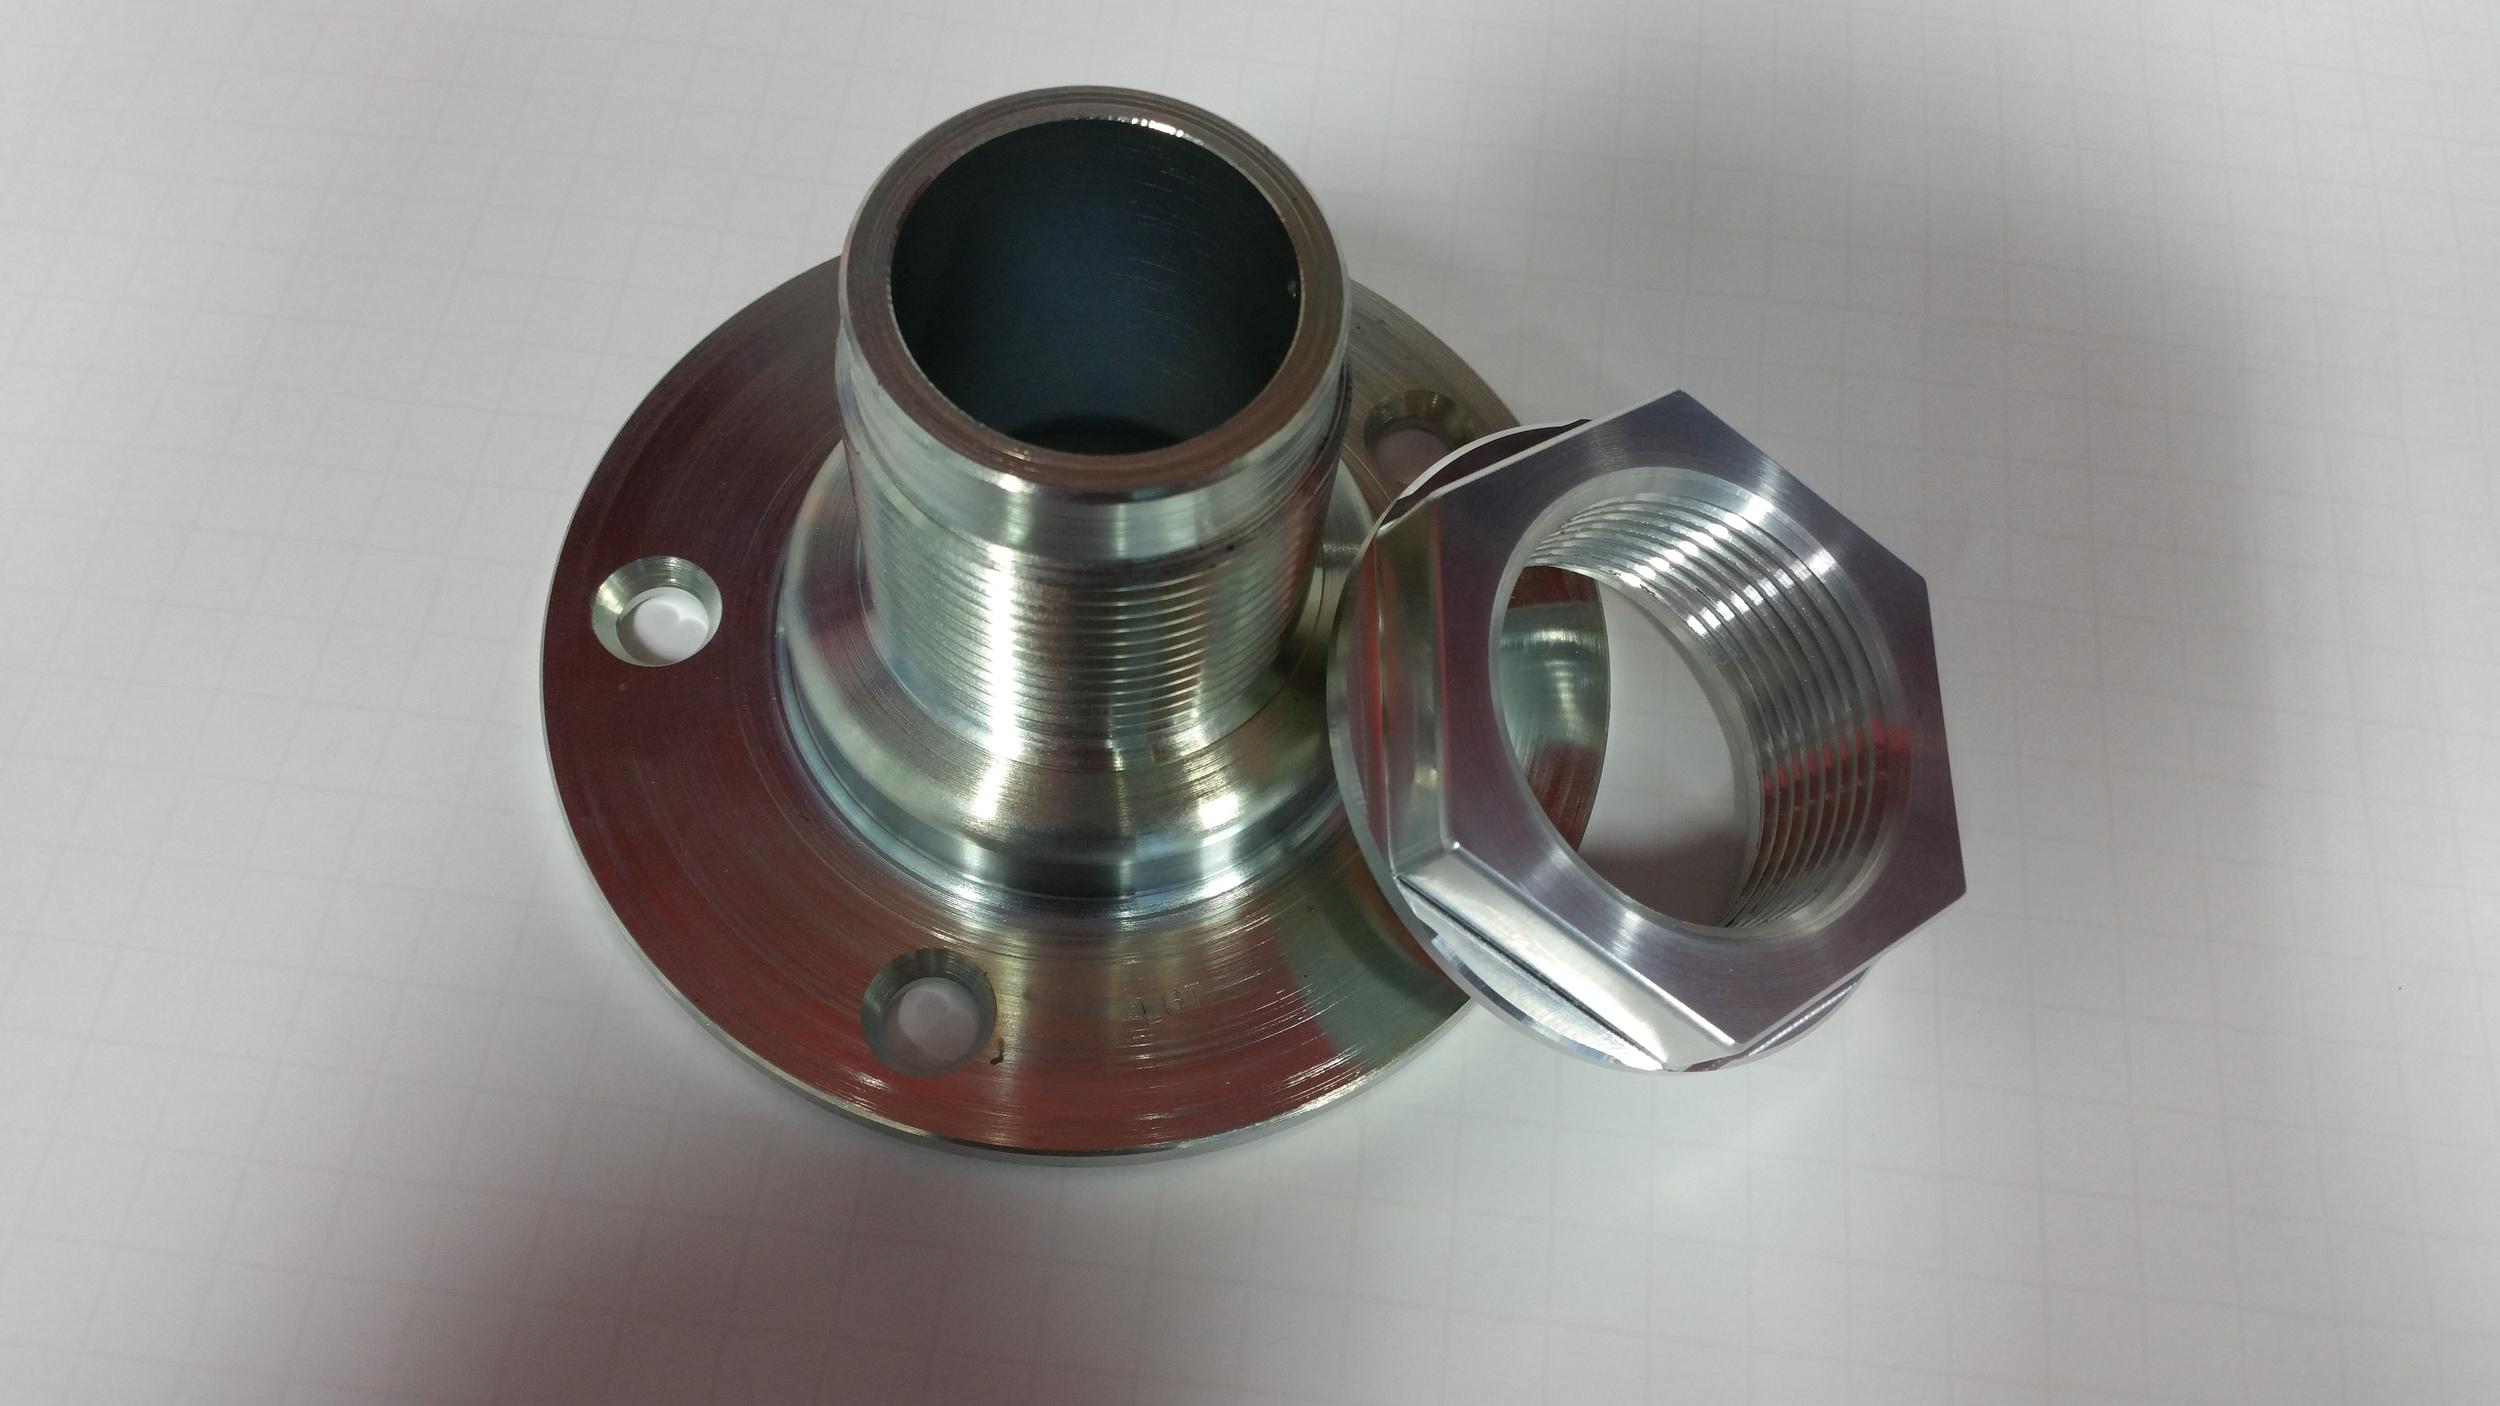 Adapter and nut custom machined for the Superlite SL-C centerlock wheel option